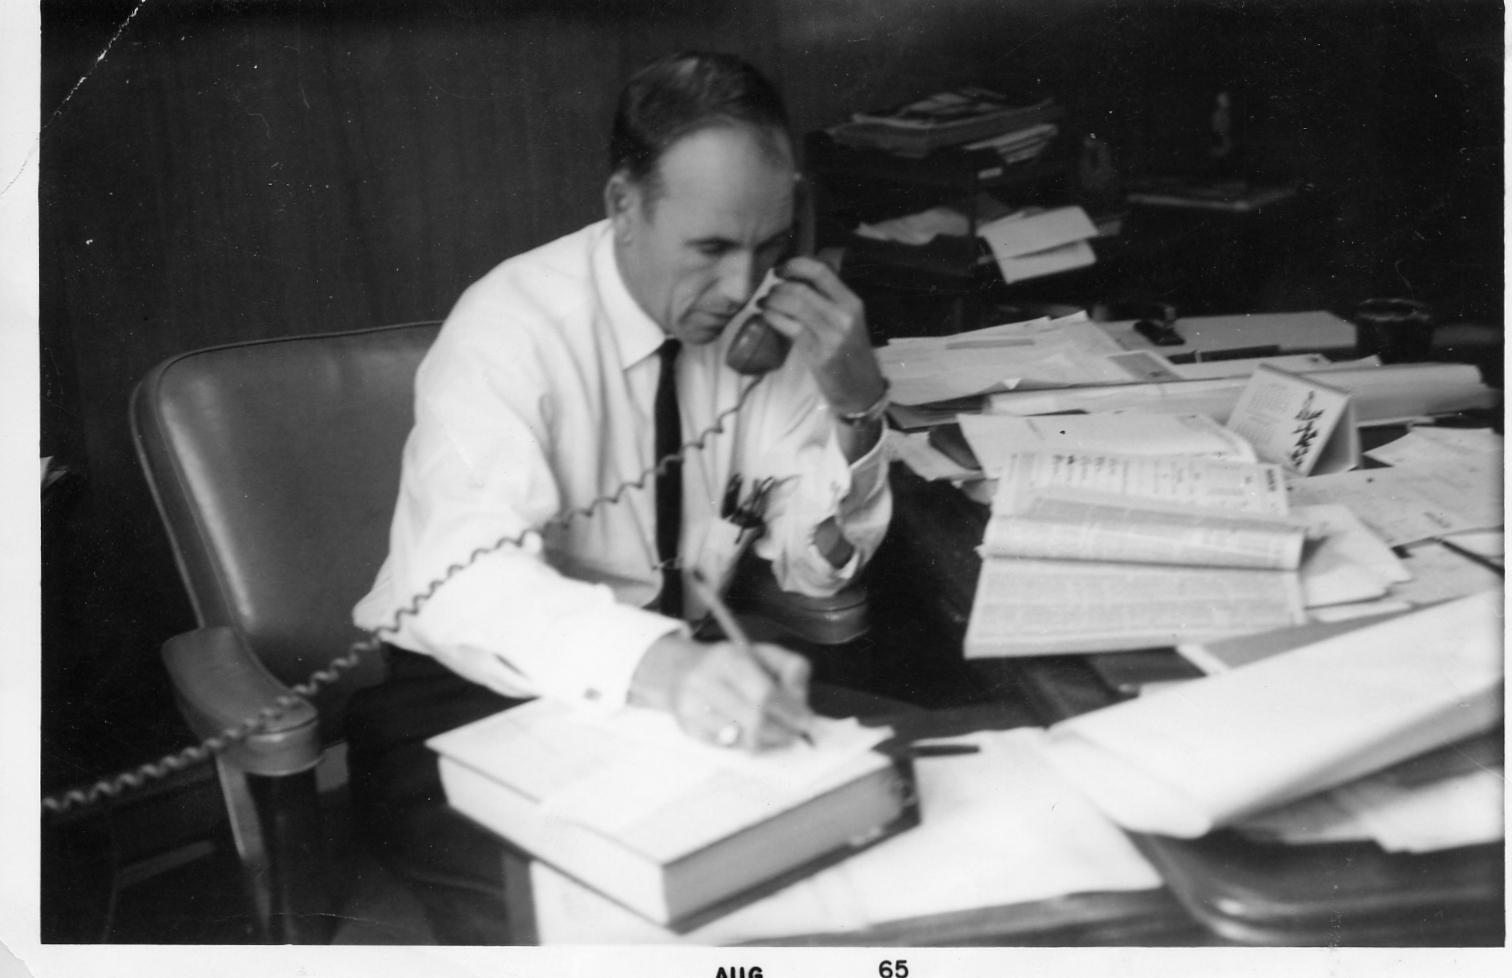 Hugh Goldsmith Engineer